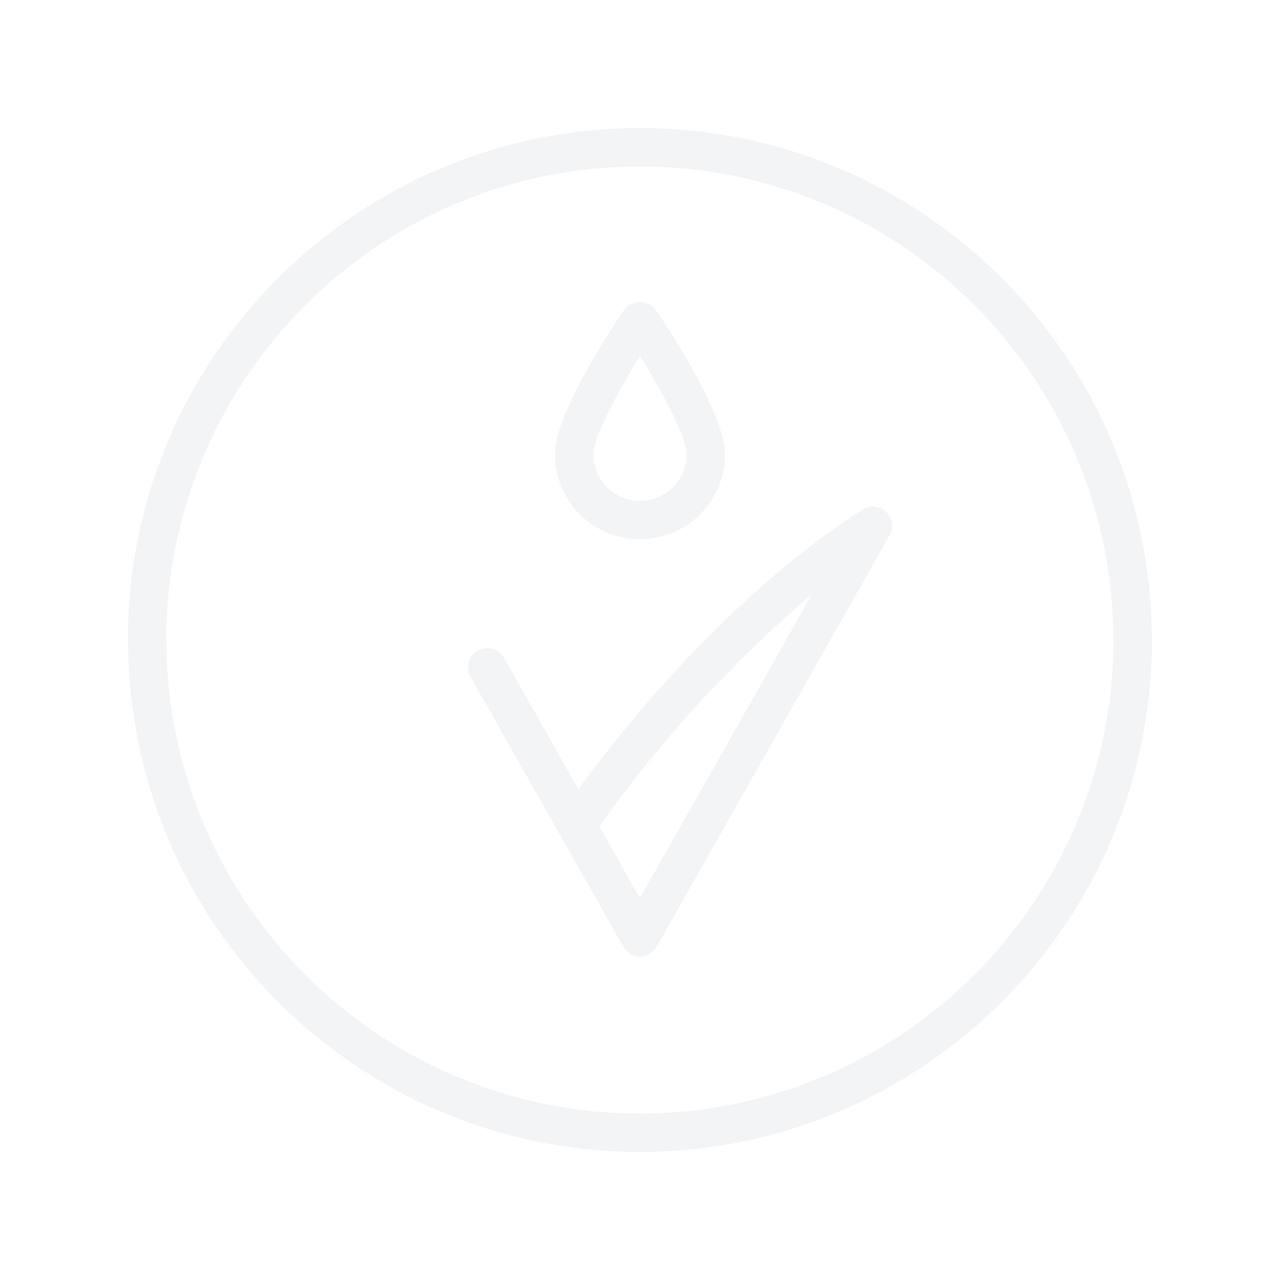 Shiseido Benefiance Extra Creamy Cleansing Foam 125ml